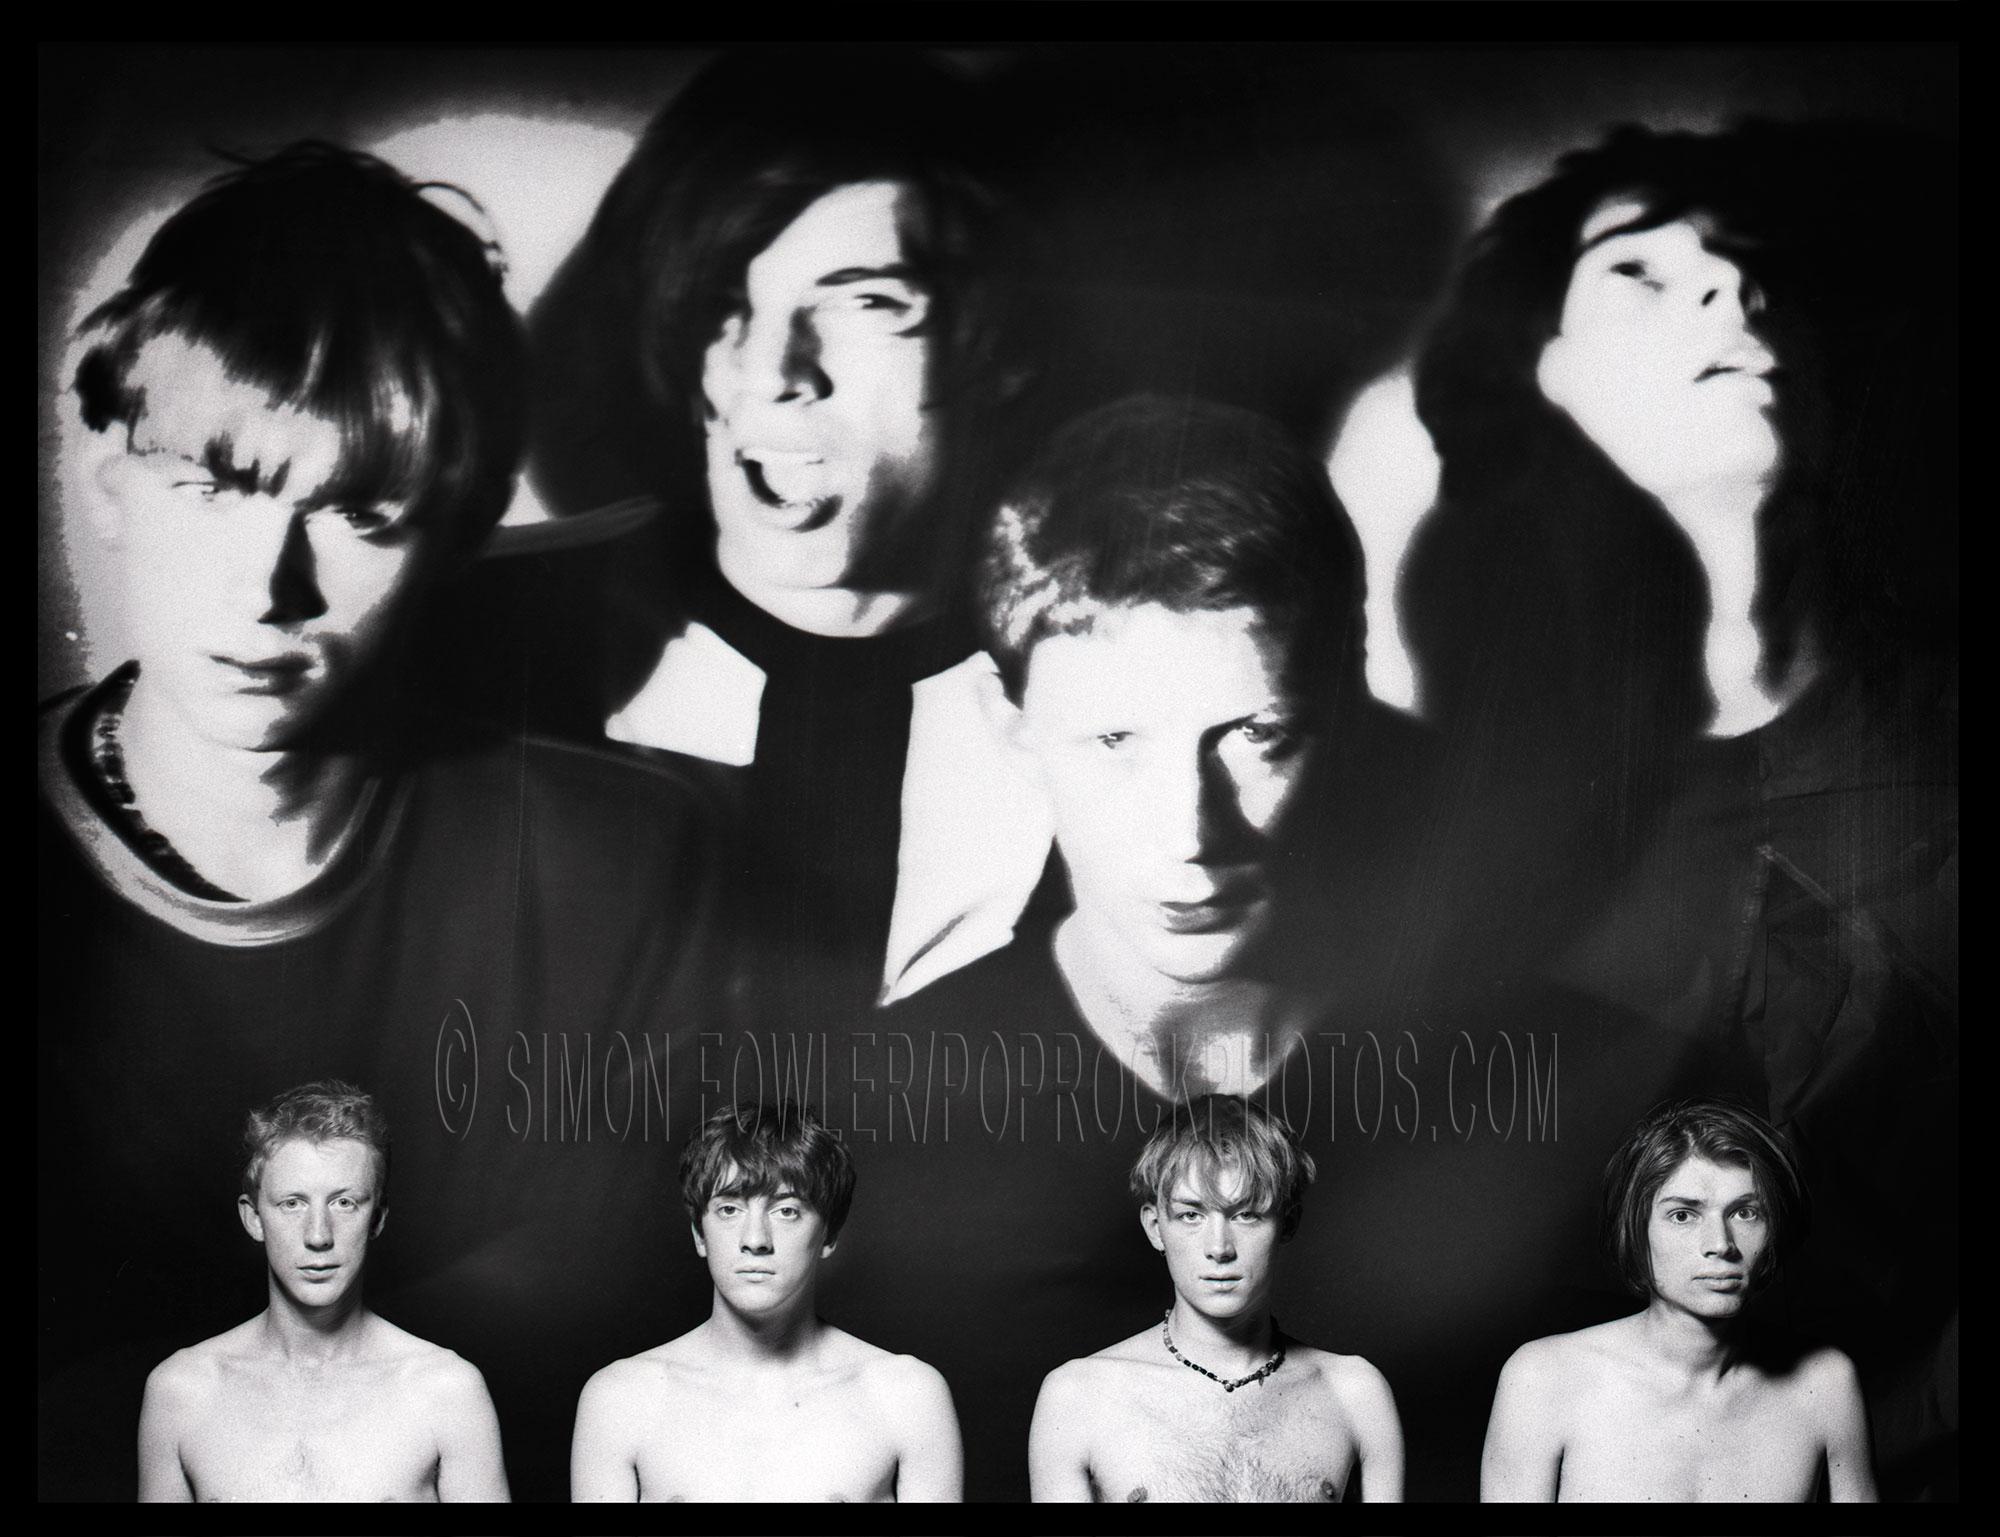 blur 1 damon albarn graham coxon alex james dave rowntree pop rock